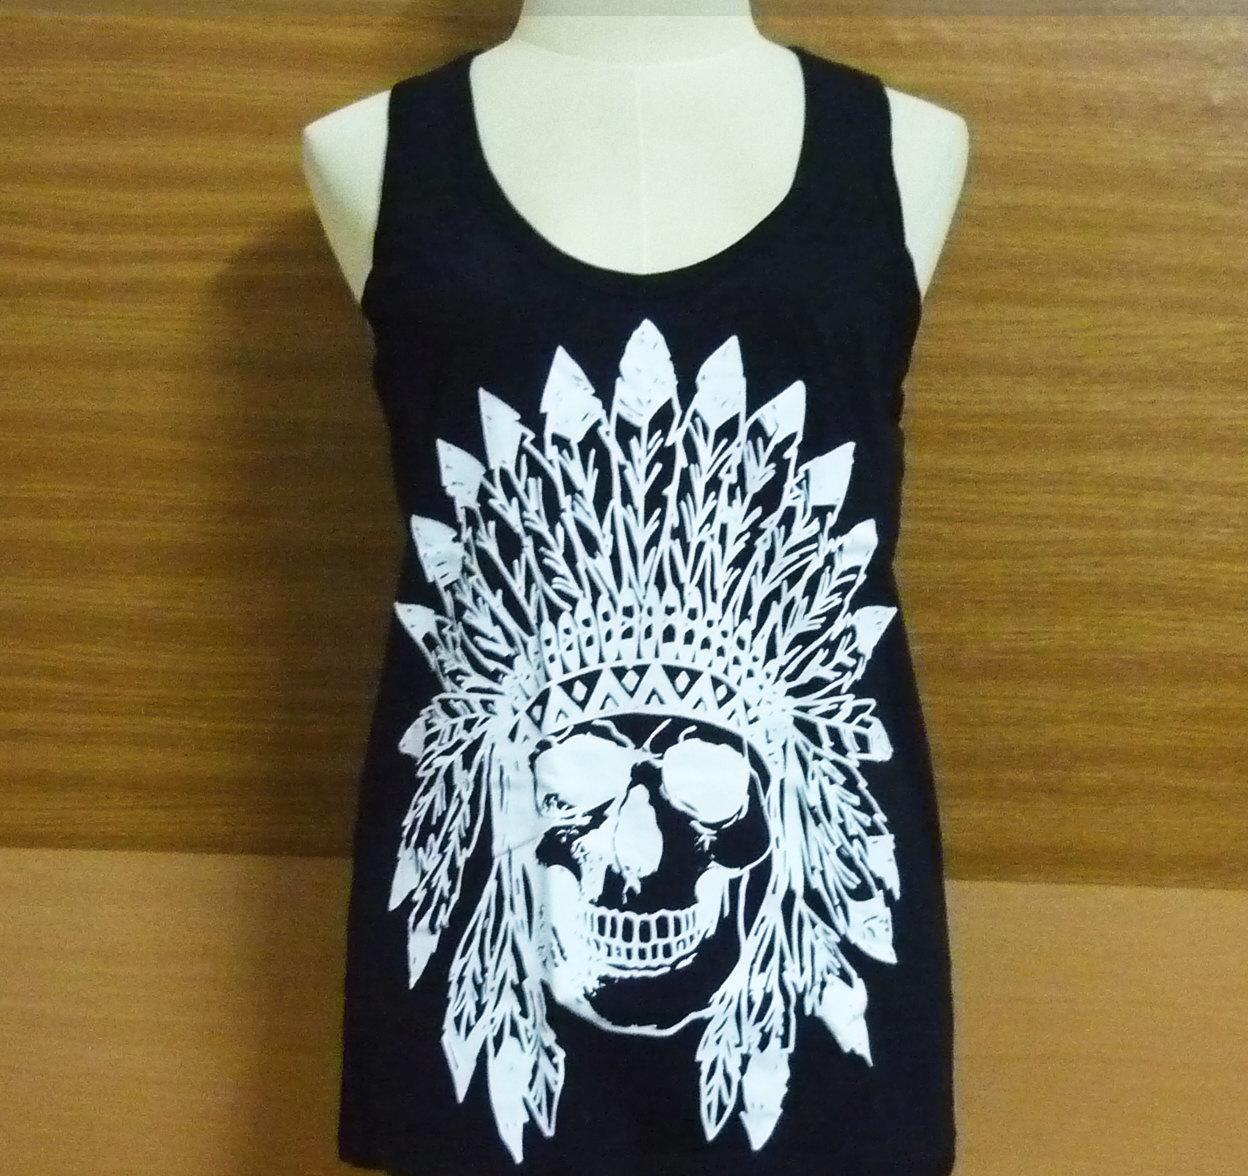 Tank top skull indian native american shirt men women vest skull tank top black cotton shirt singlet sleeveless/ fashional clothing s m l xl